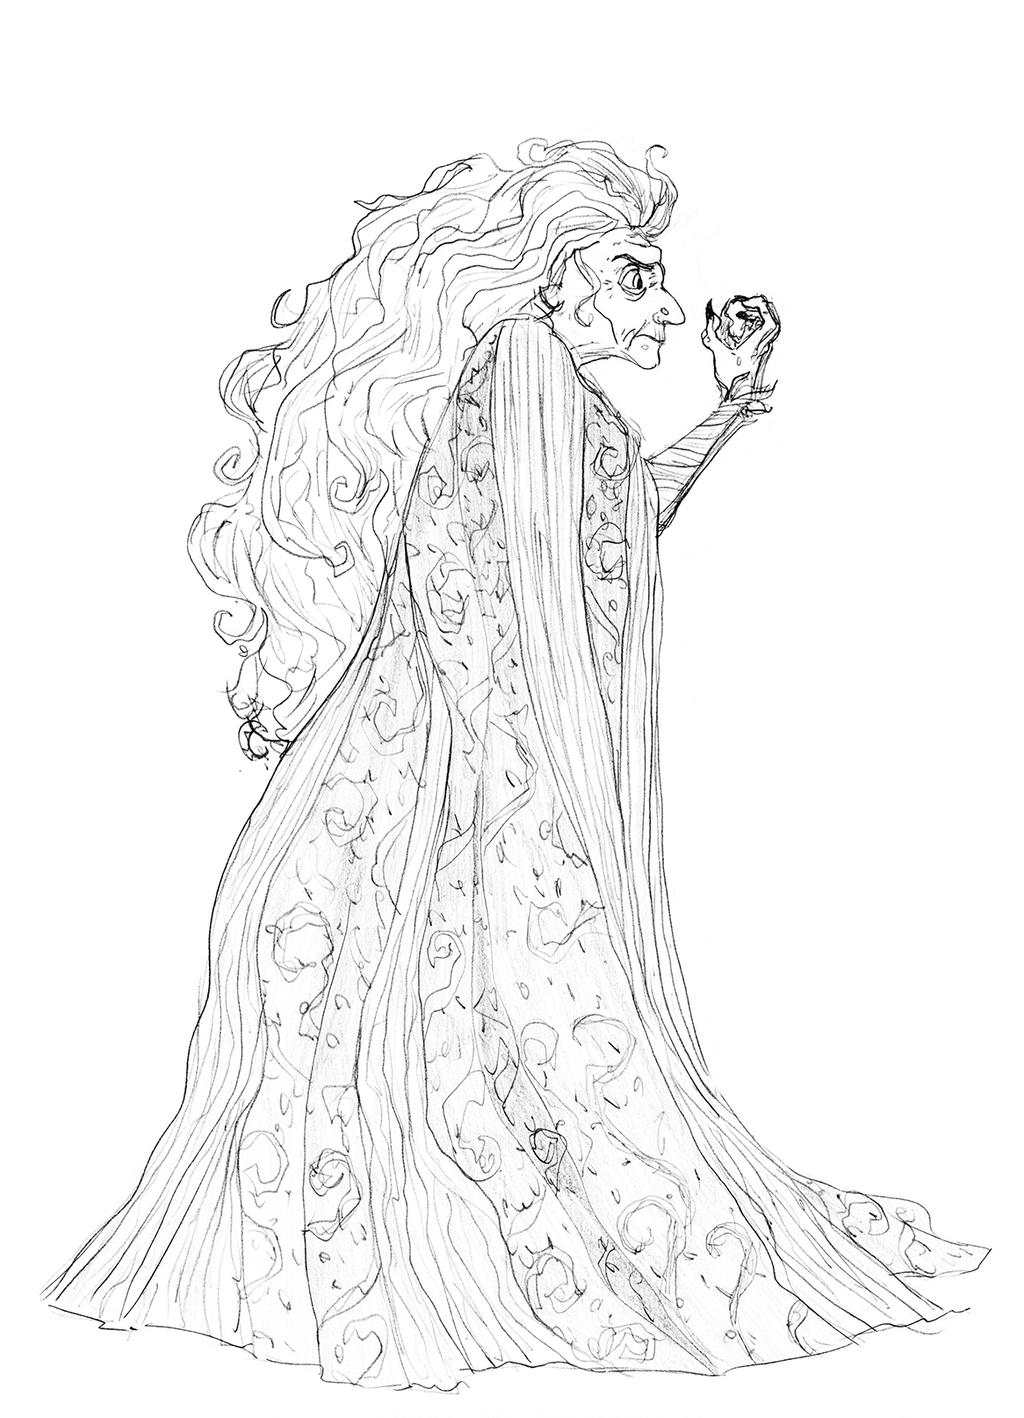 Evil Queen Hag Version (Charming) by djeffers on DeviantArt